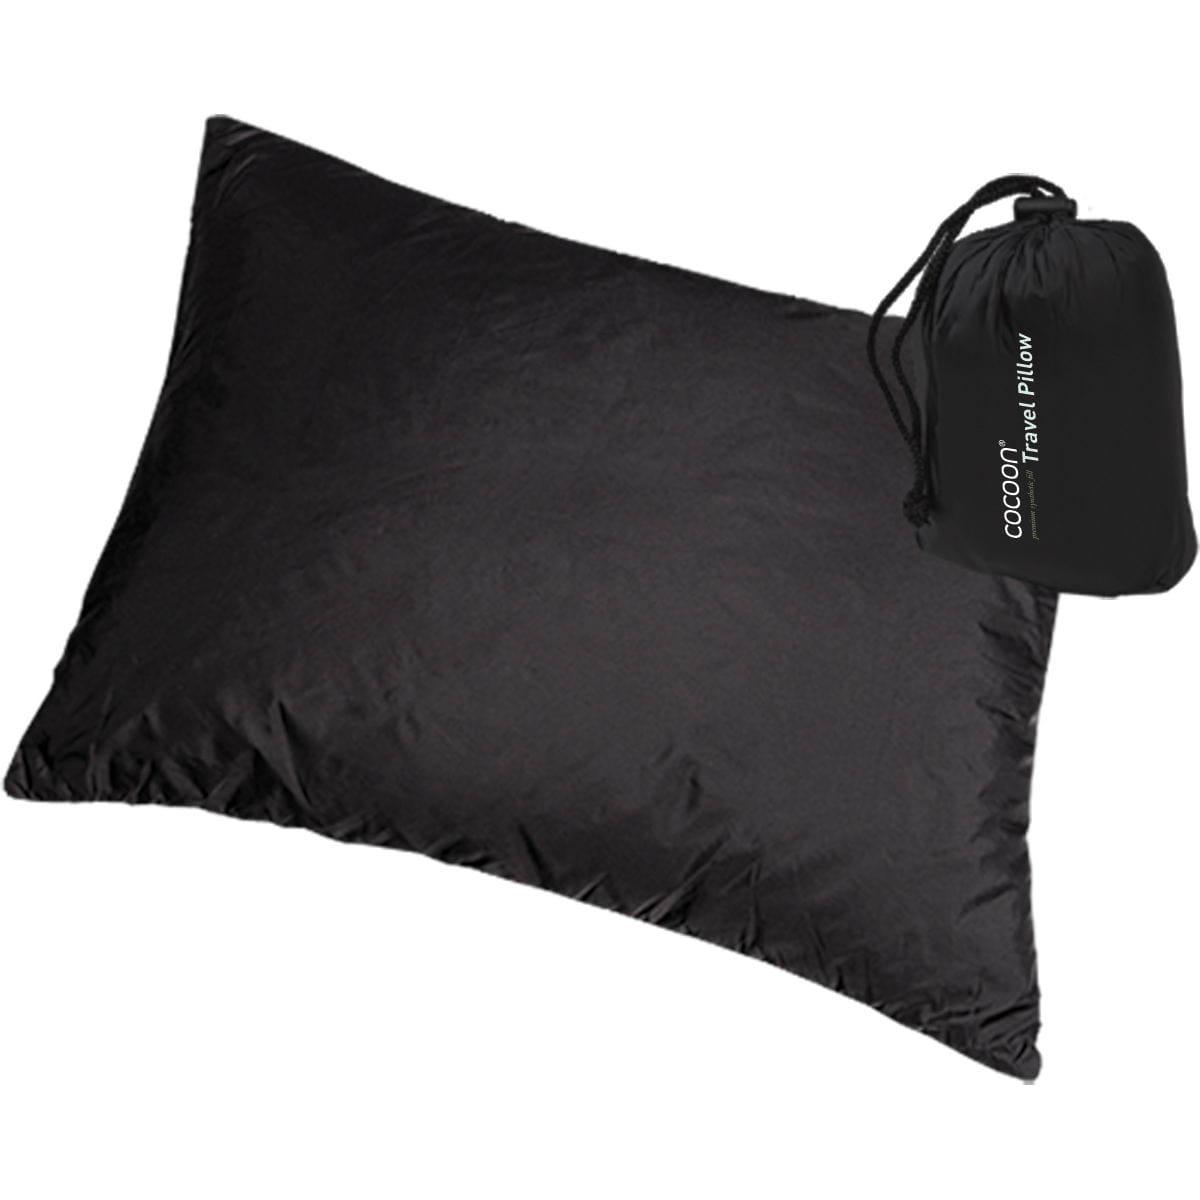 cocoon synthetic pillow sp large reise kopfkissen g nstig online kaufen. Black Bedroom Furniture Sets. Home Design Ideas